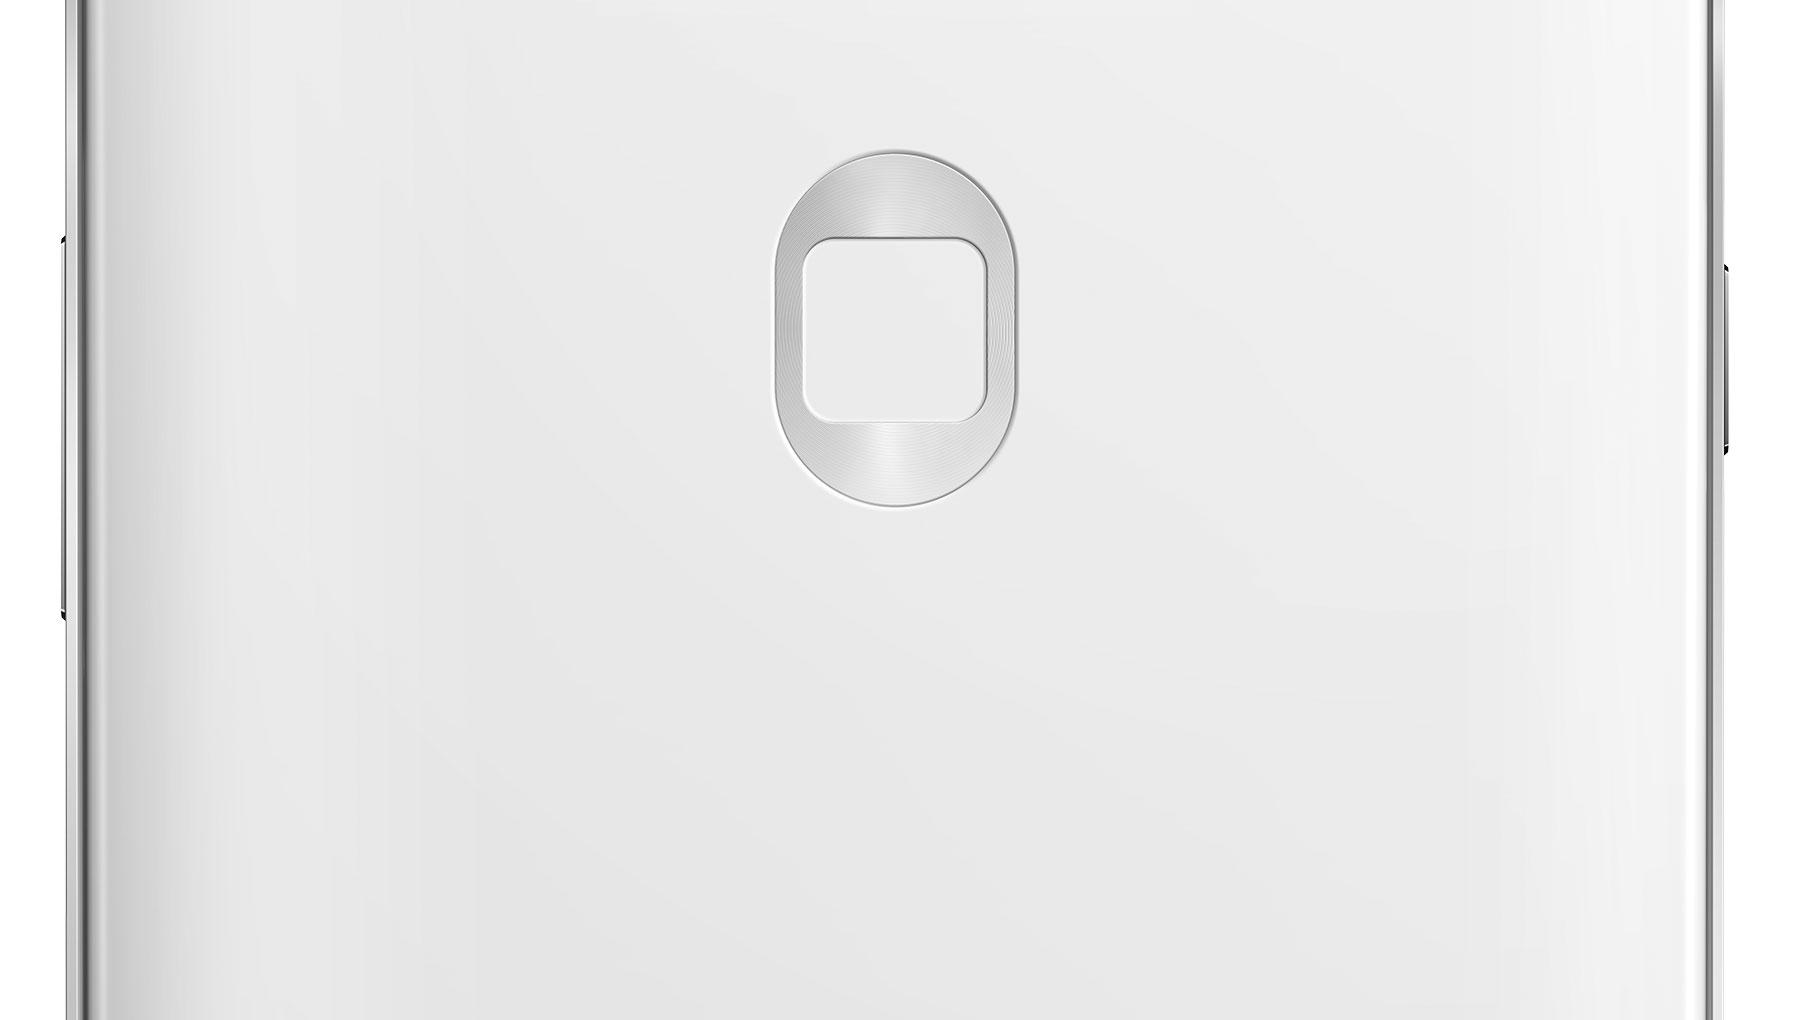 OPPO N3  ความปลอดภัยอีกขั้นด้วยระบบสแกนลายนิ้วมือ